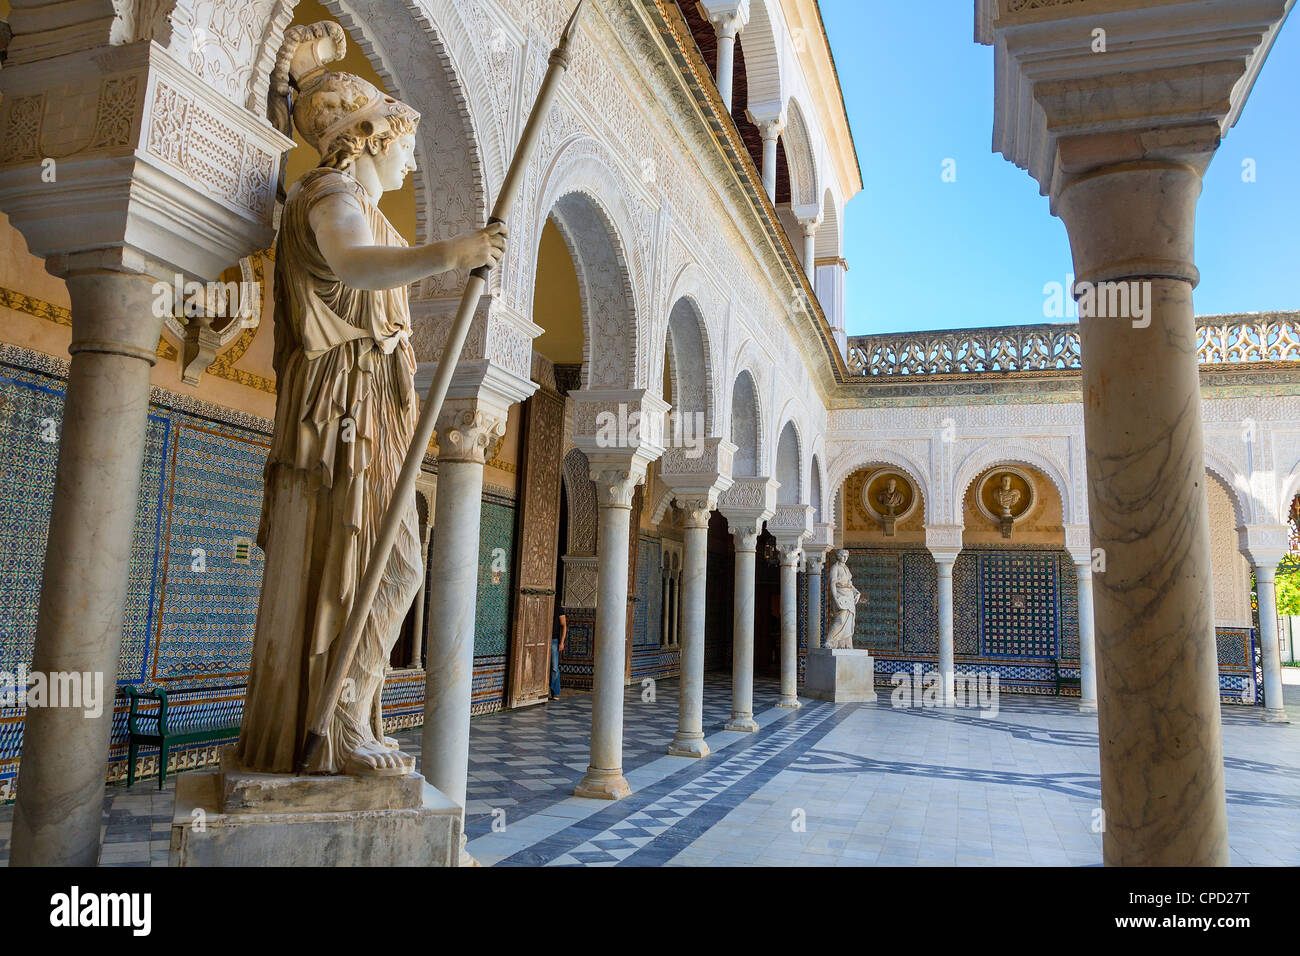 Europa, Spanien Andalusien, Sevilla, Patio im Casa de Pilatos Stockbild